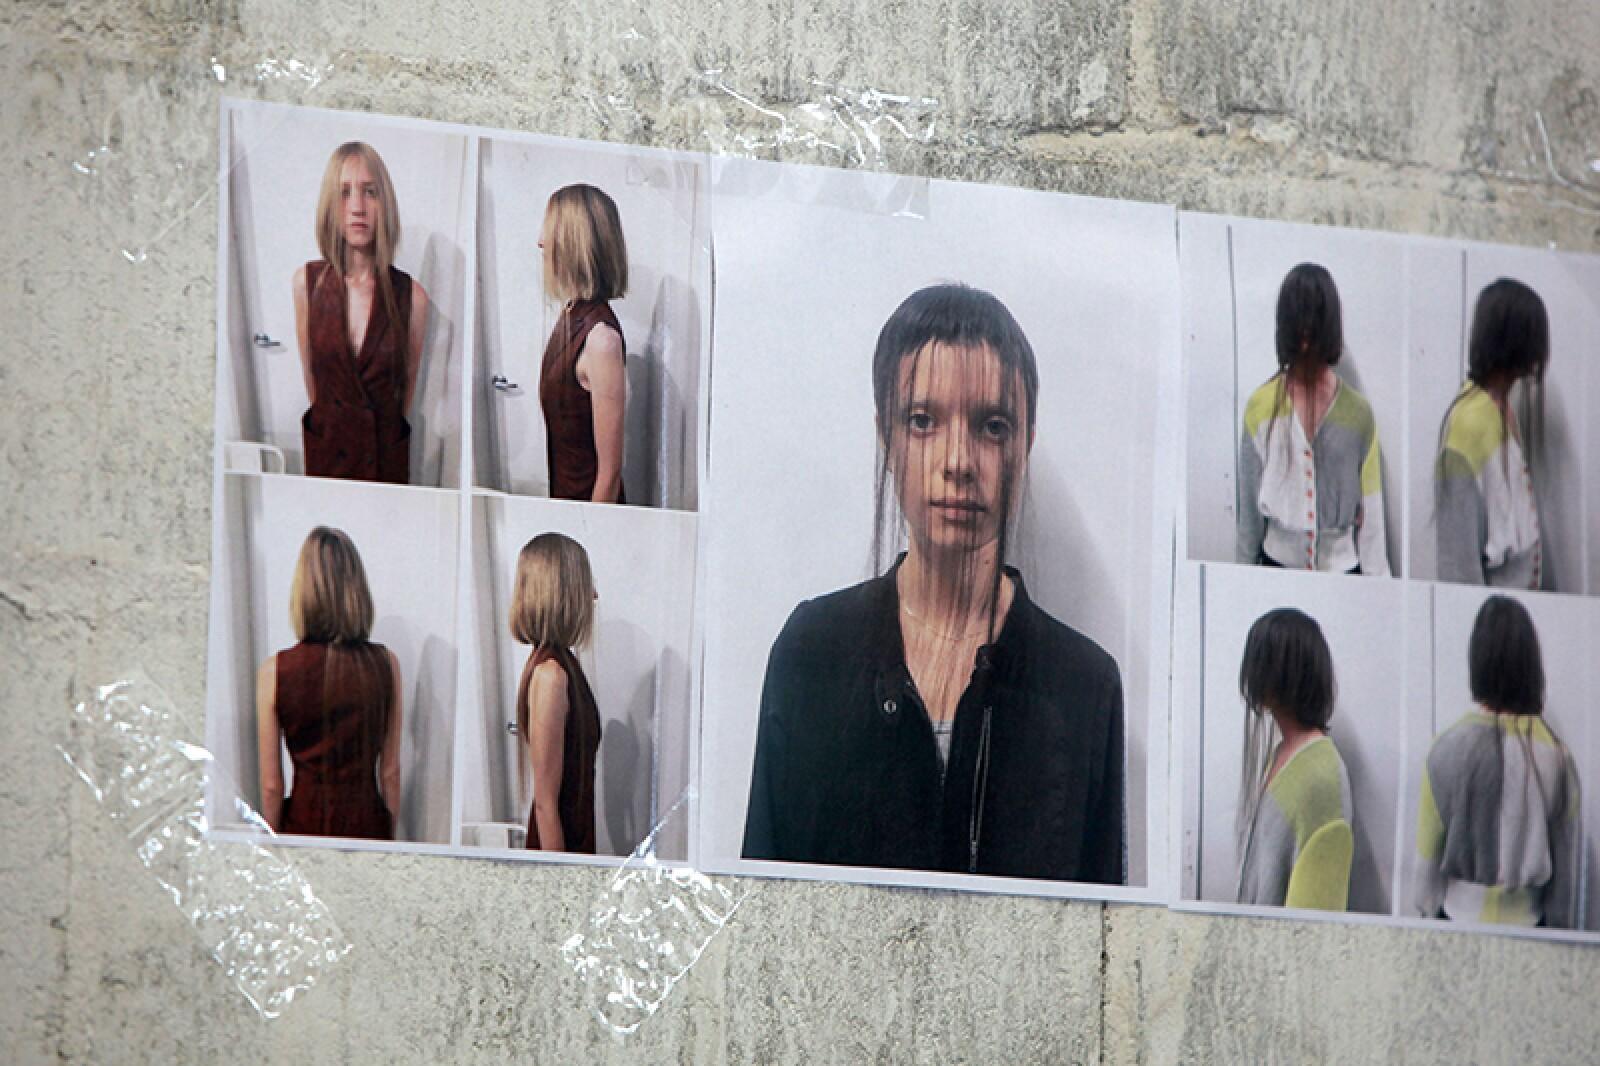 Eckhaus Latta show, Backstage, Spring Summer 2019, New York Fashion Week, USA - 08 Sep 2018